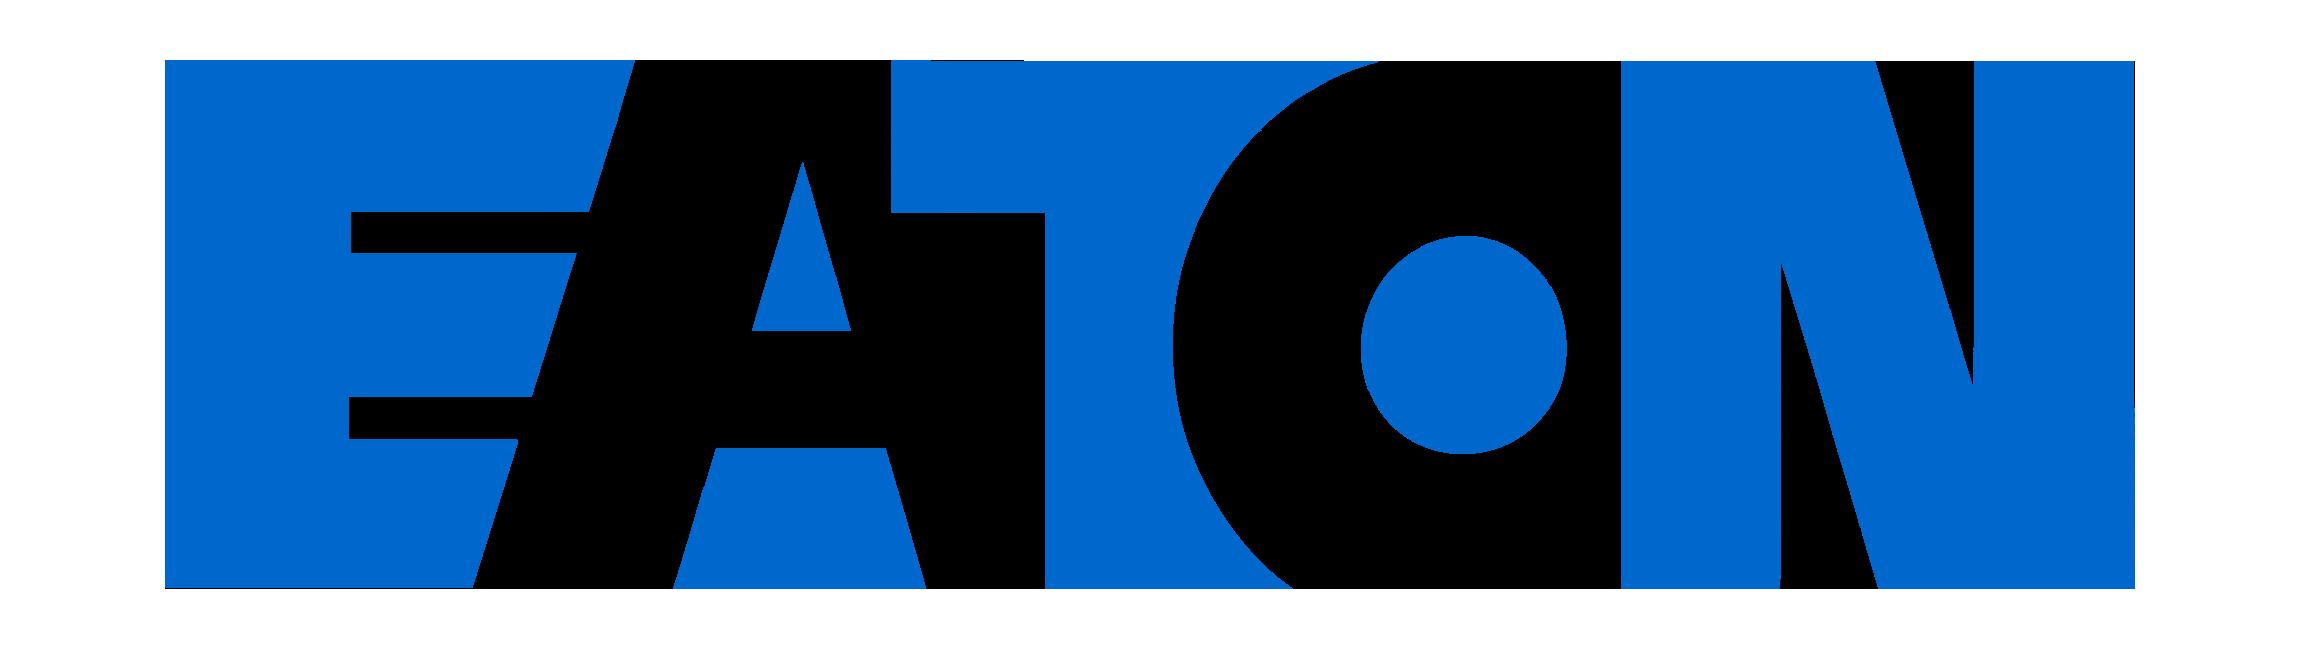 Eaton-Logo.png